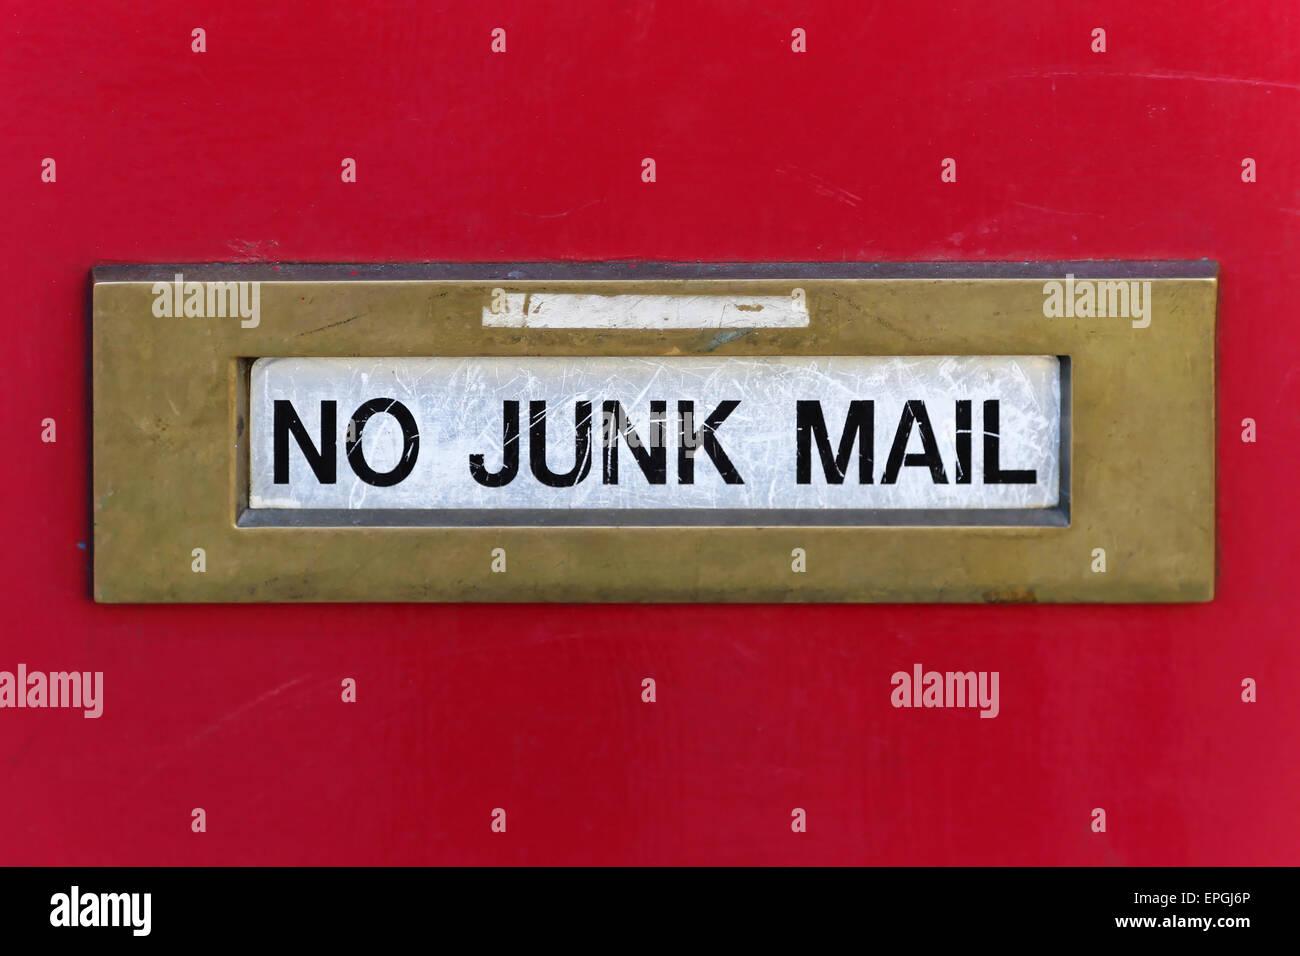 No junk mail - Stock Image